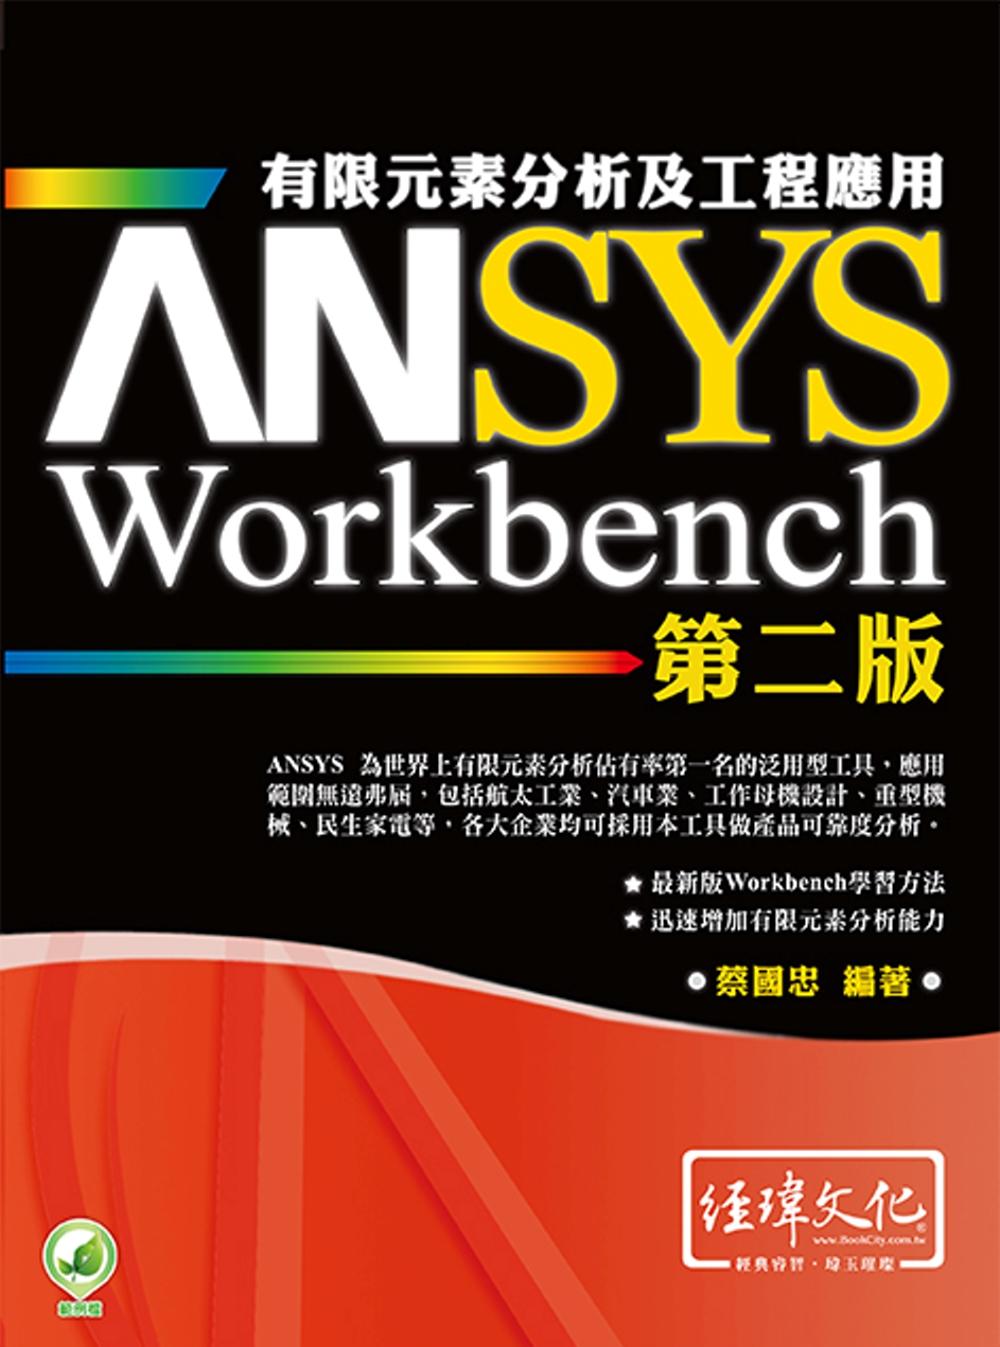 ANSYS/Workbench 有限元素分析及工程應用(附綠色範例檔)(第二版)